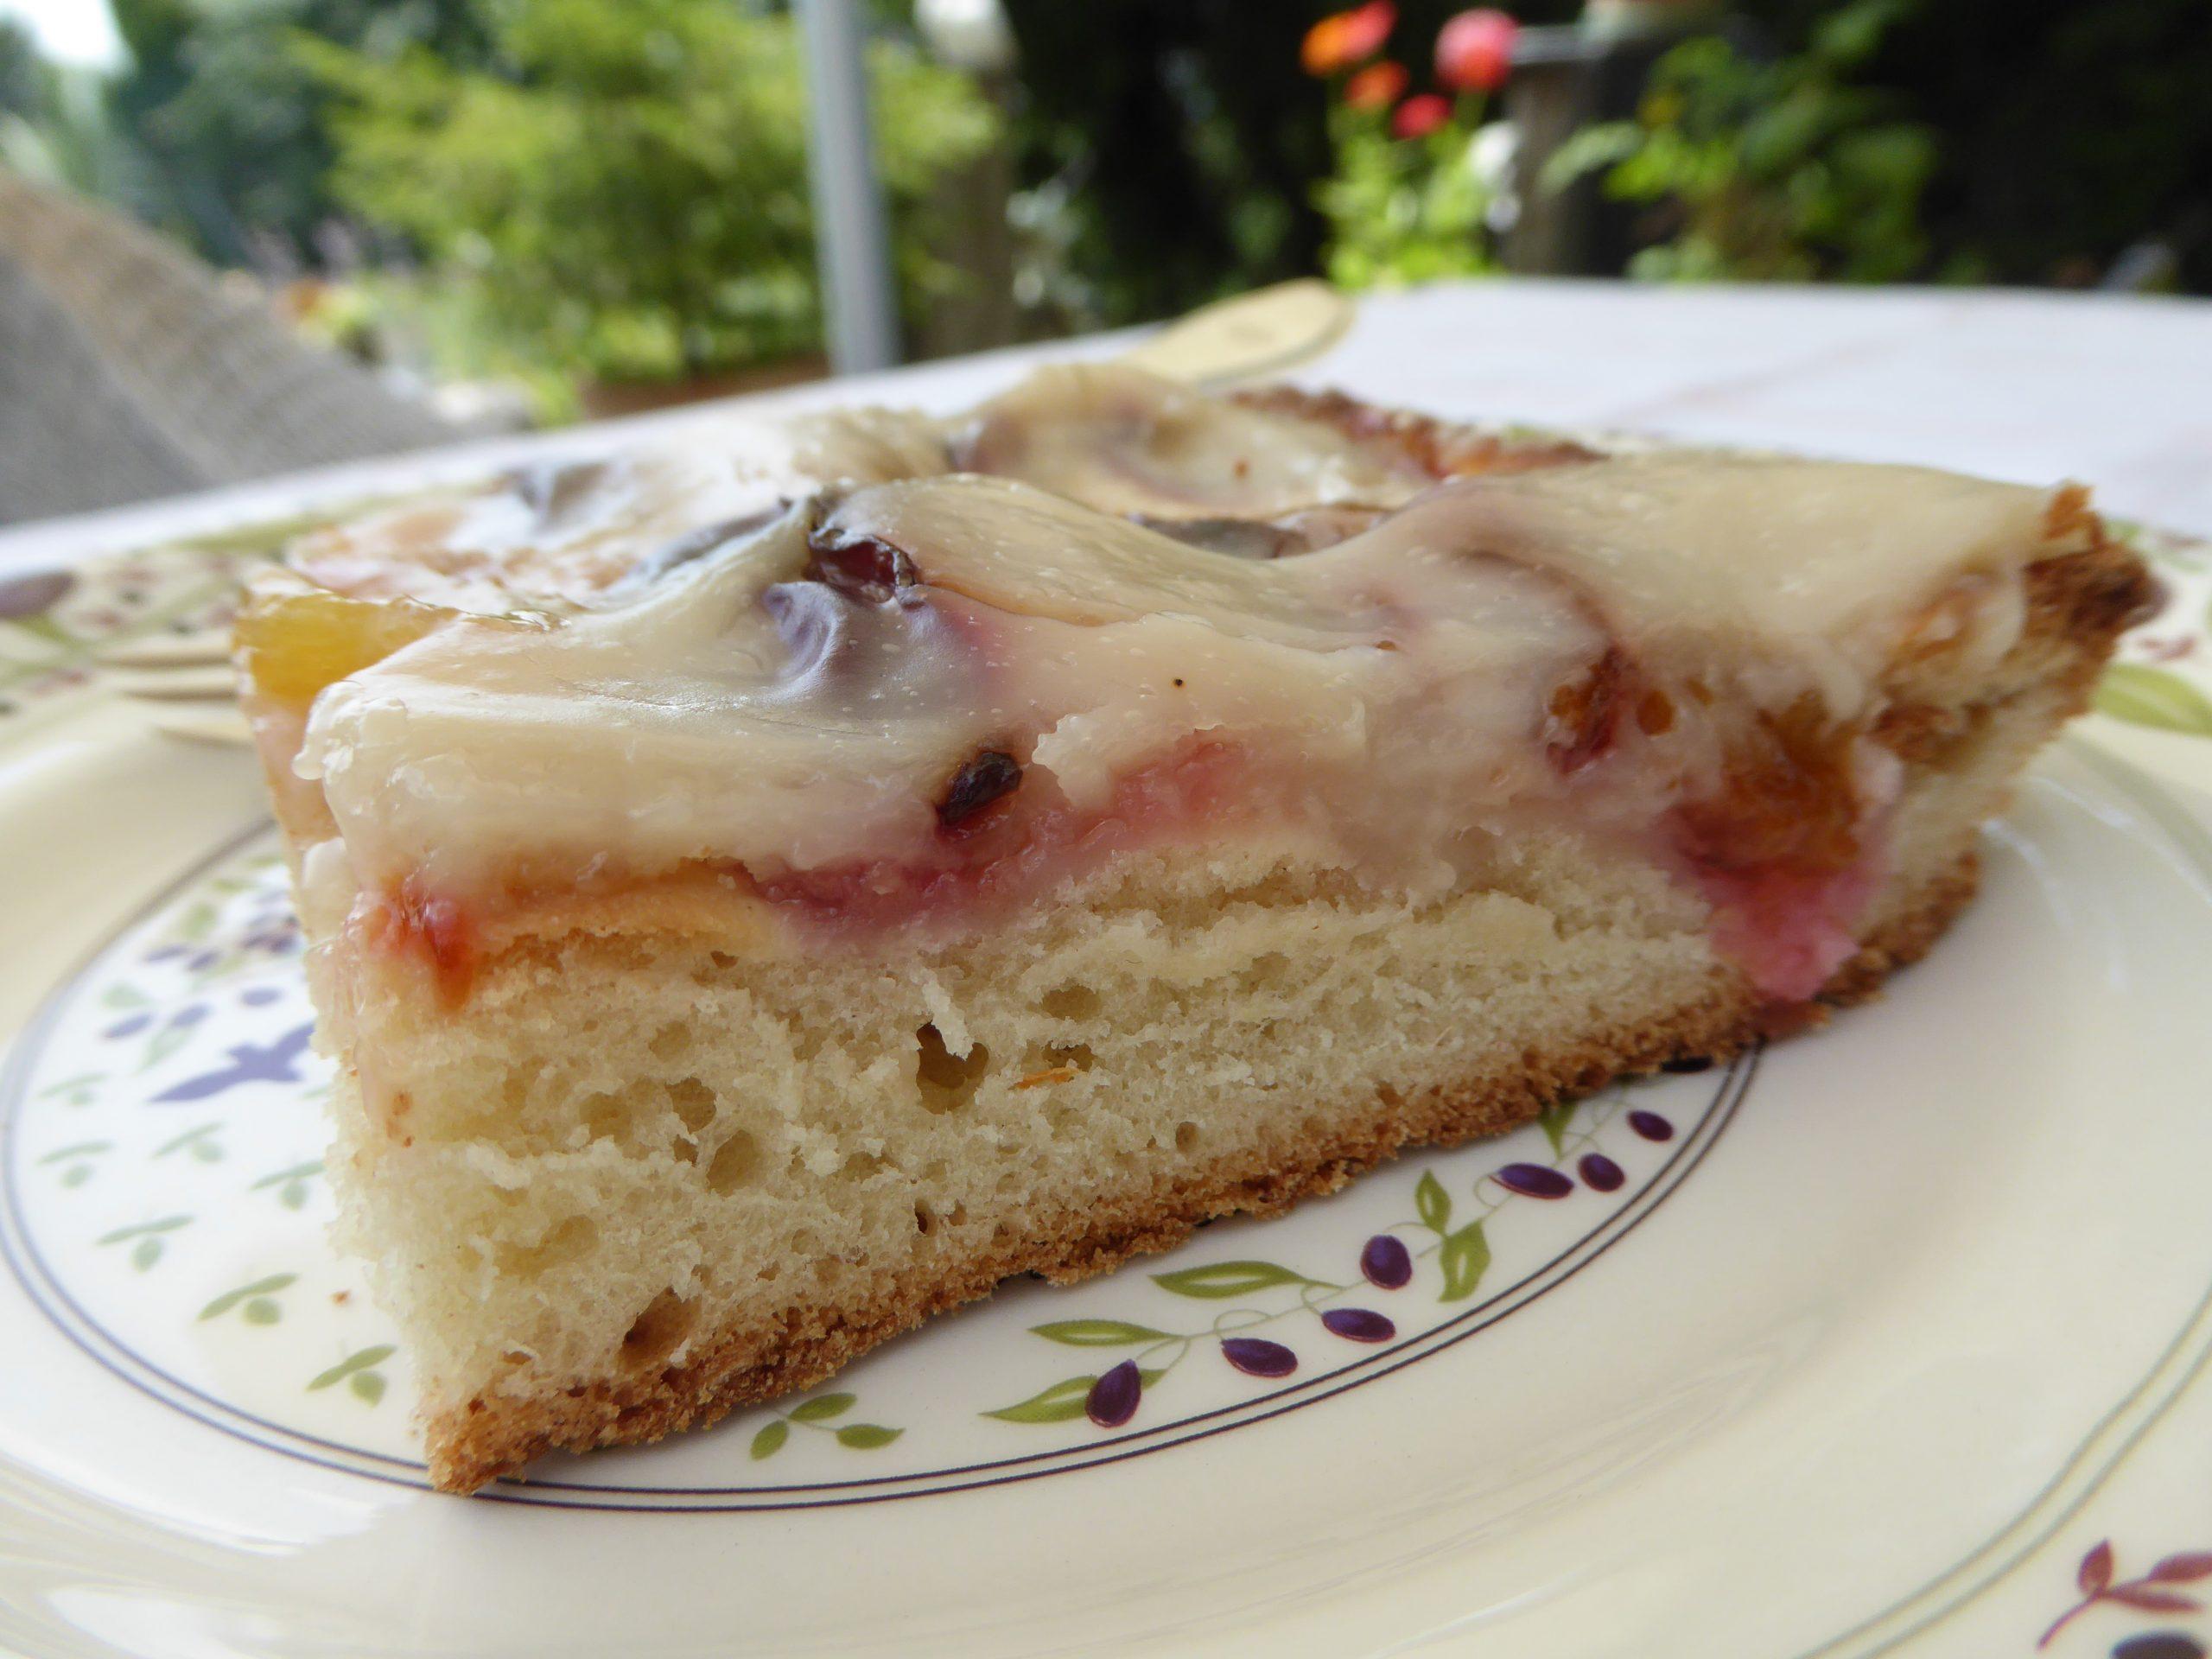 Piece of vegan Italian plum cake